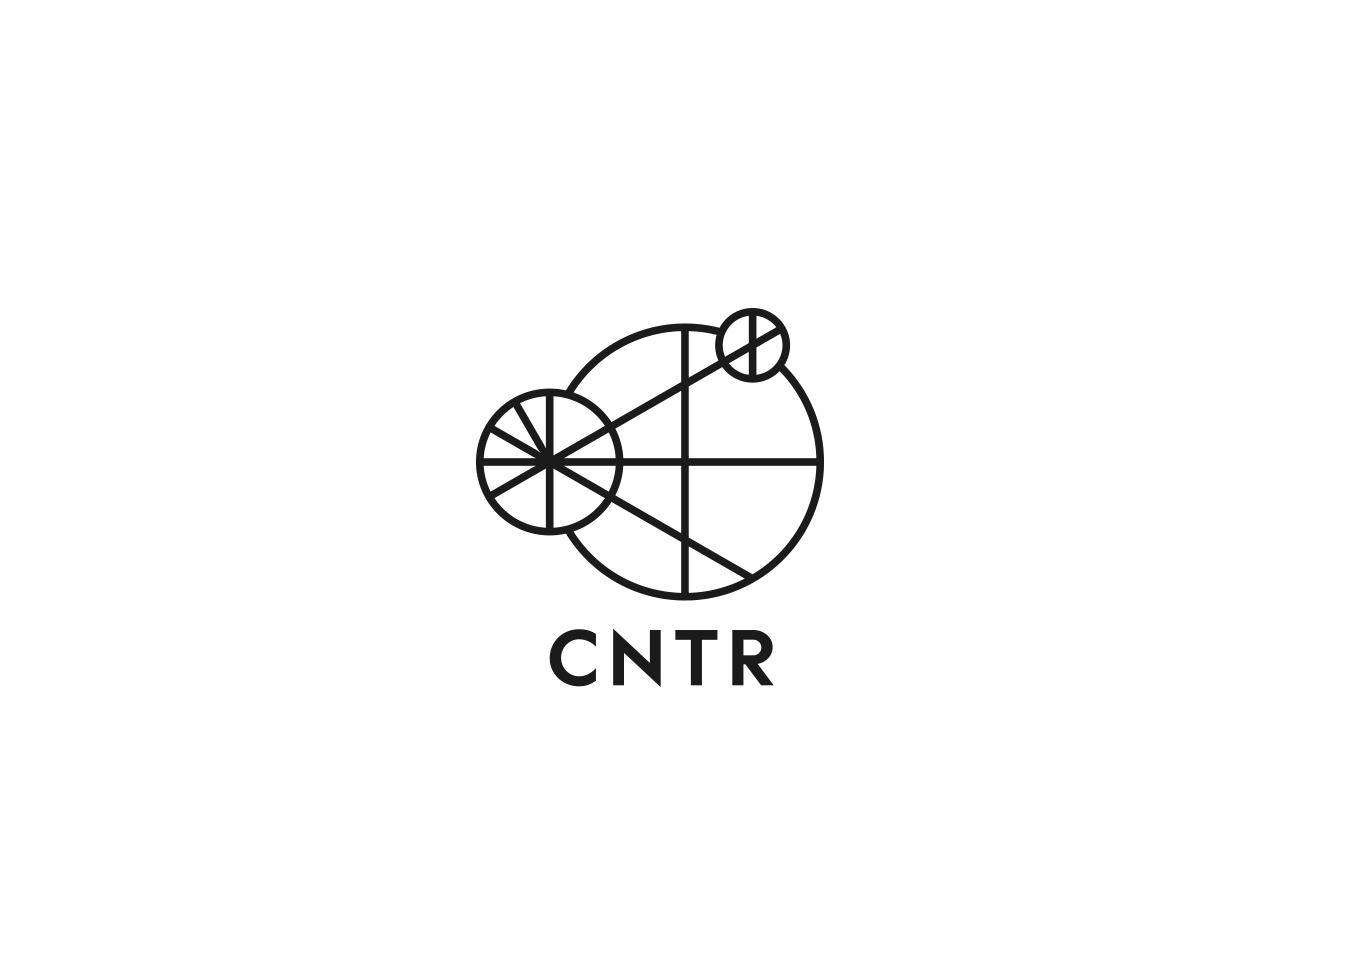 cntr_logo_2.jpg